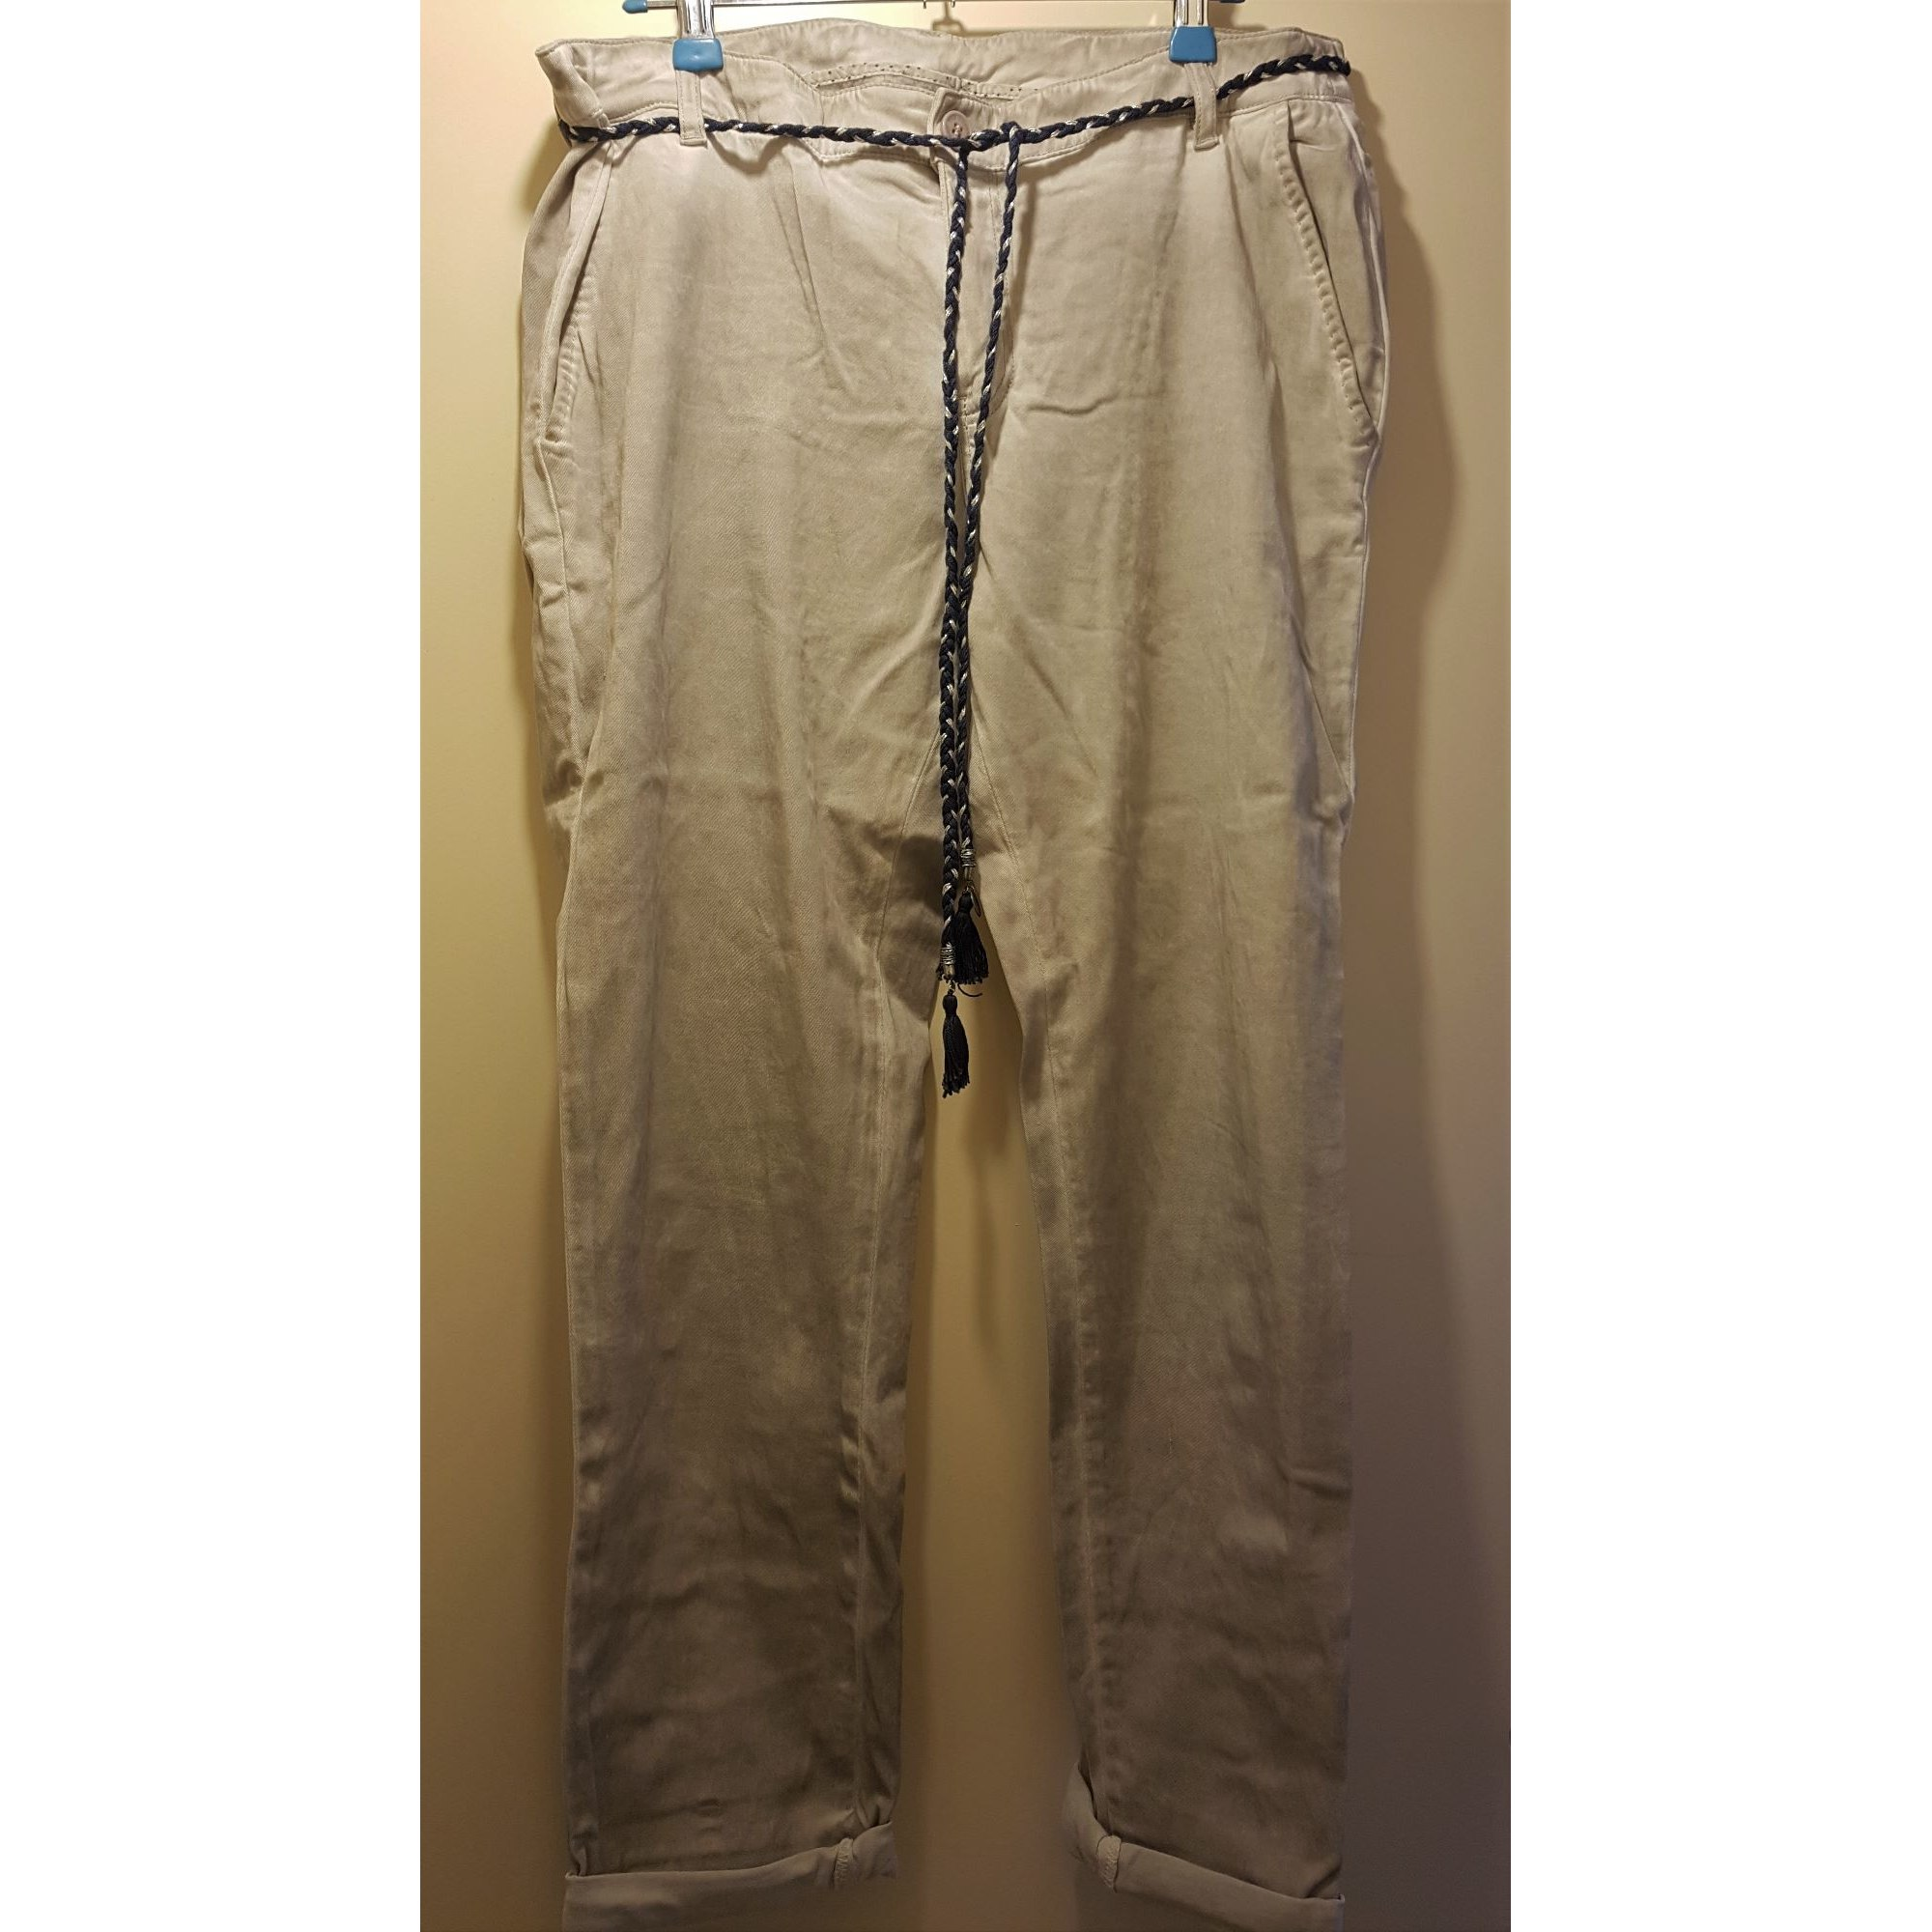 Pantalon droit IKKS Blanc, blanc cassé, écru